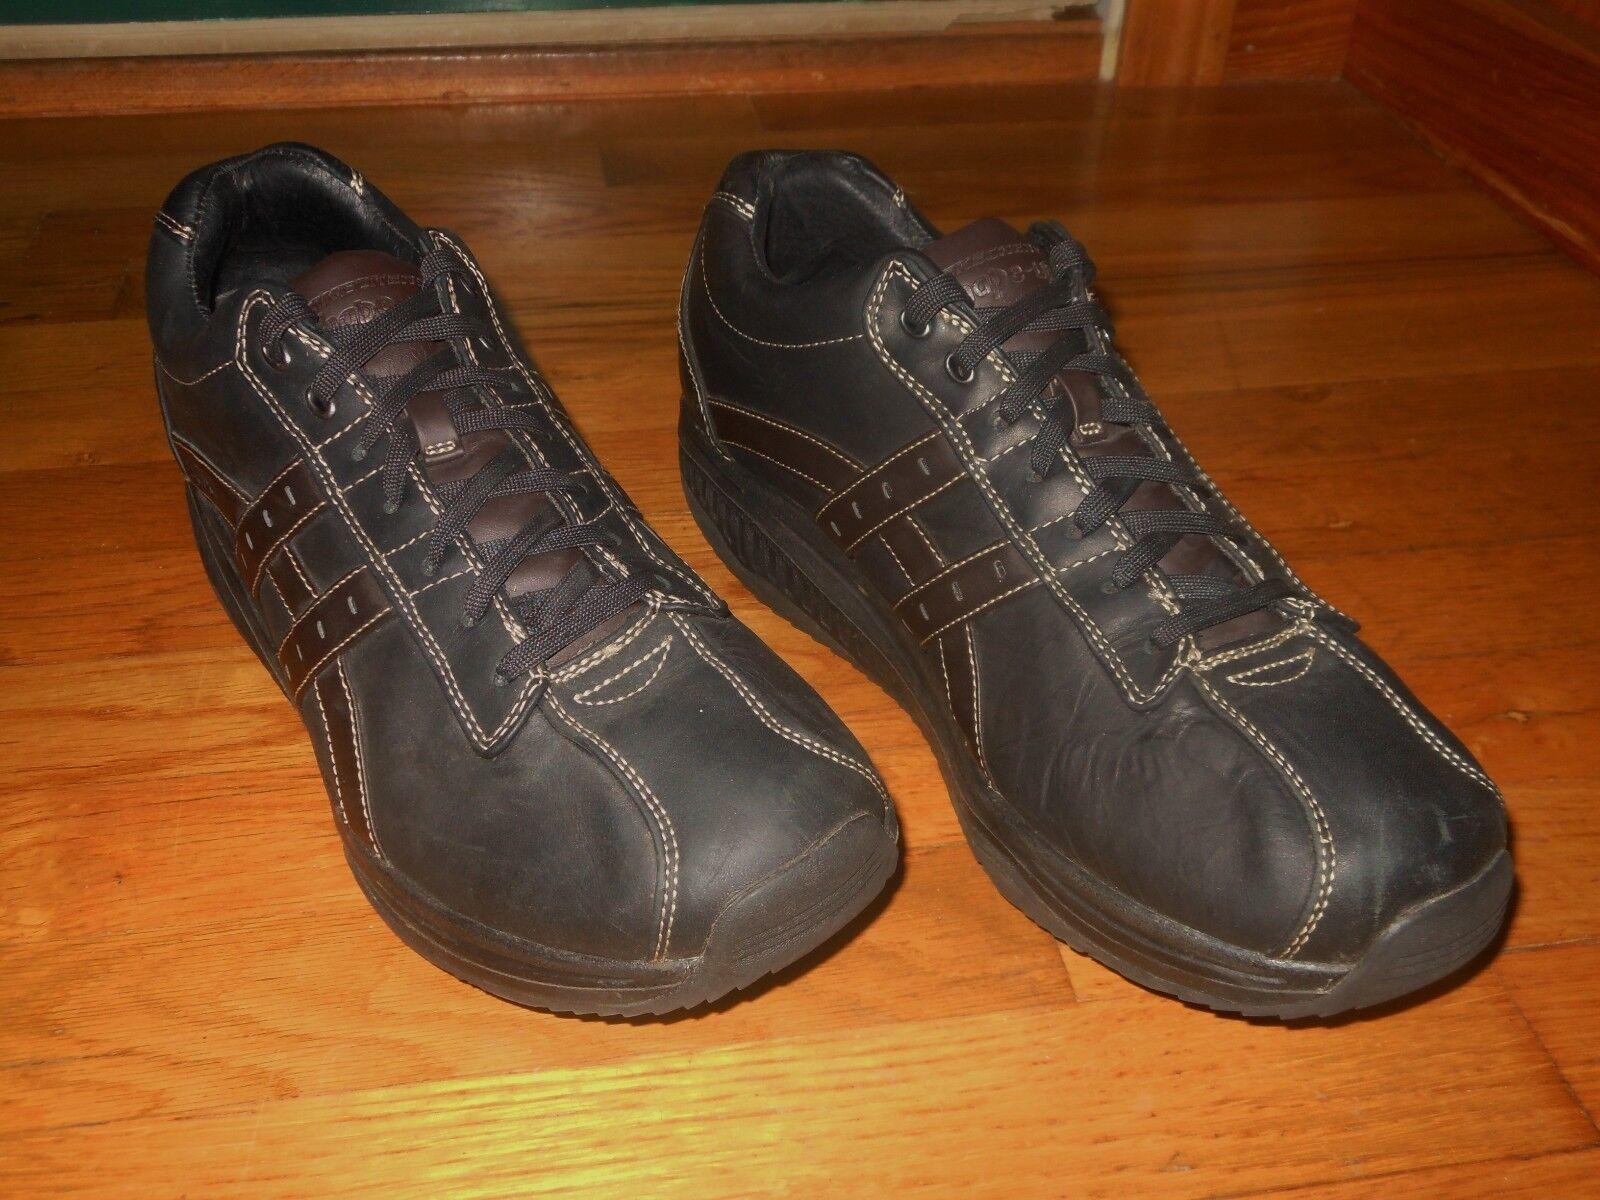 SKECHERS Shape-Ups Overhaul men's toning shoes - Sz 12 EW - Excellent cond